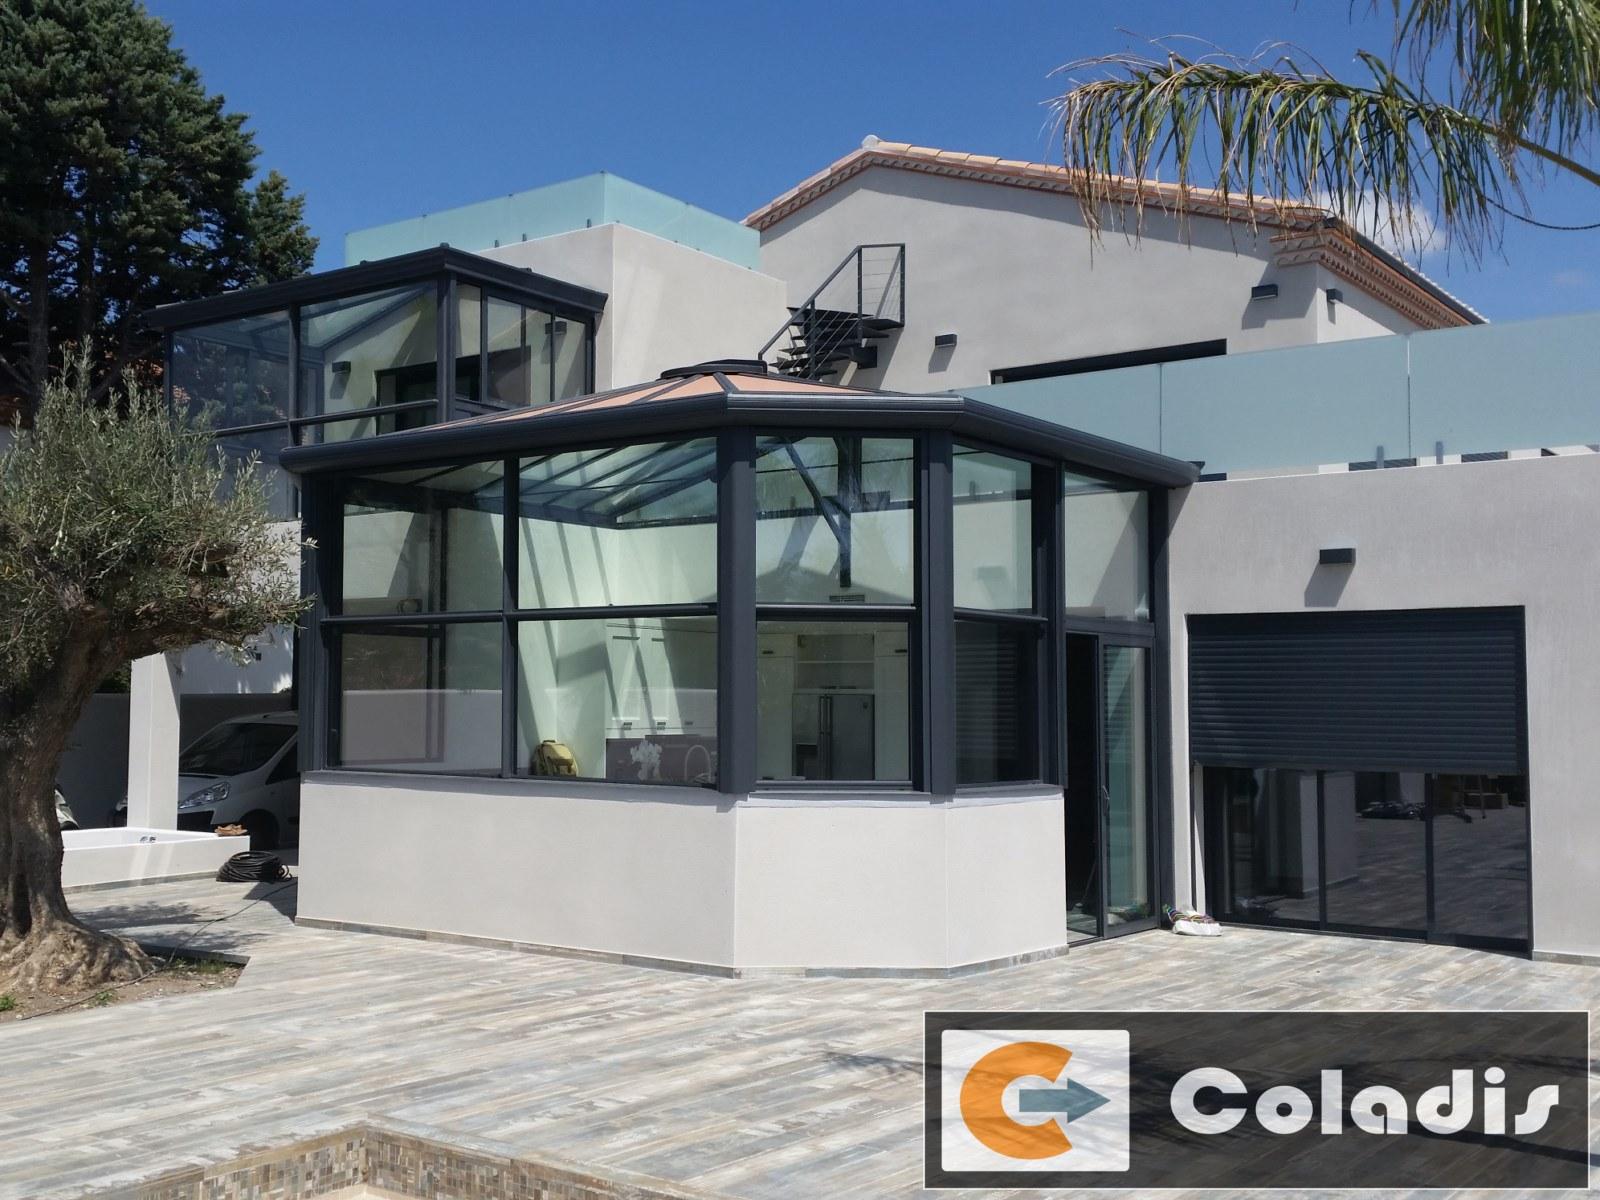 Véranda design en deux parties à Vias (Hérault 49) - Coladis - Véranda Design